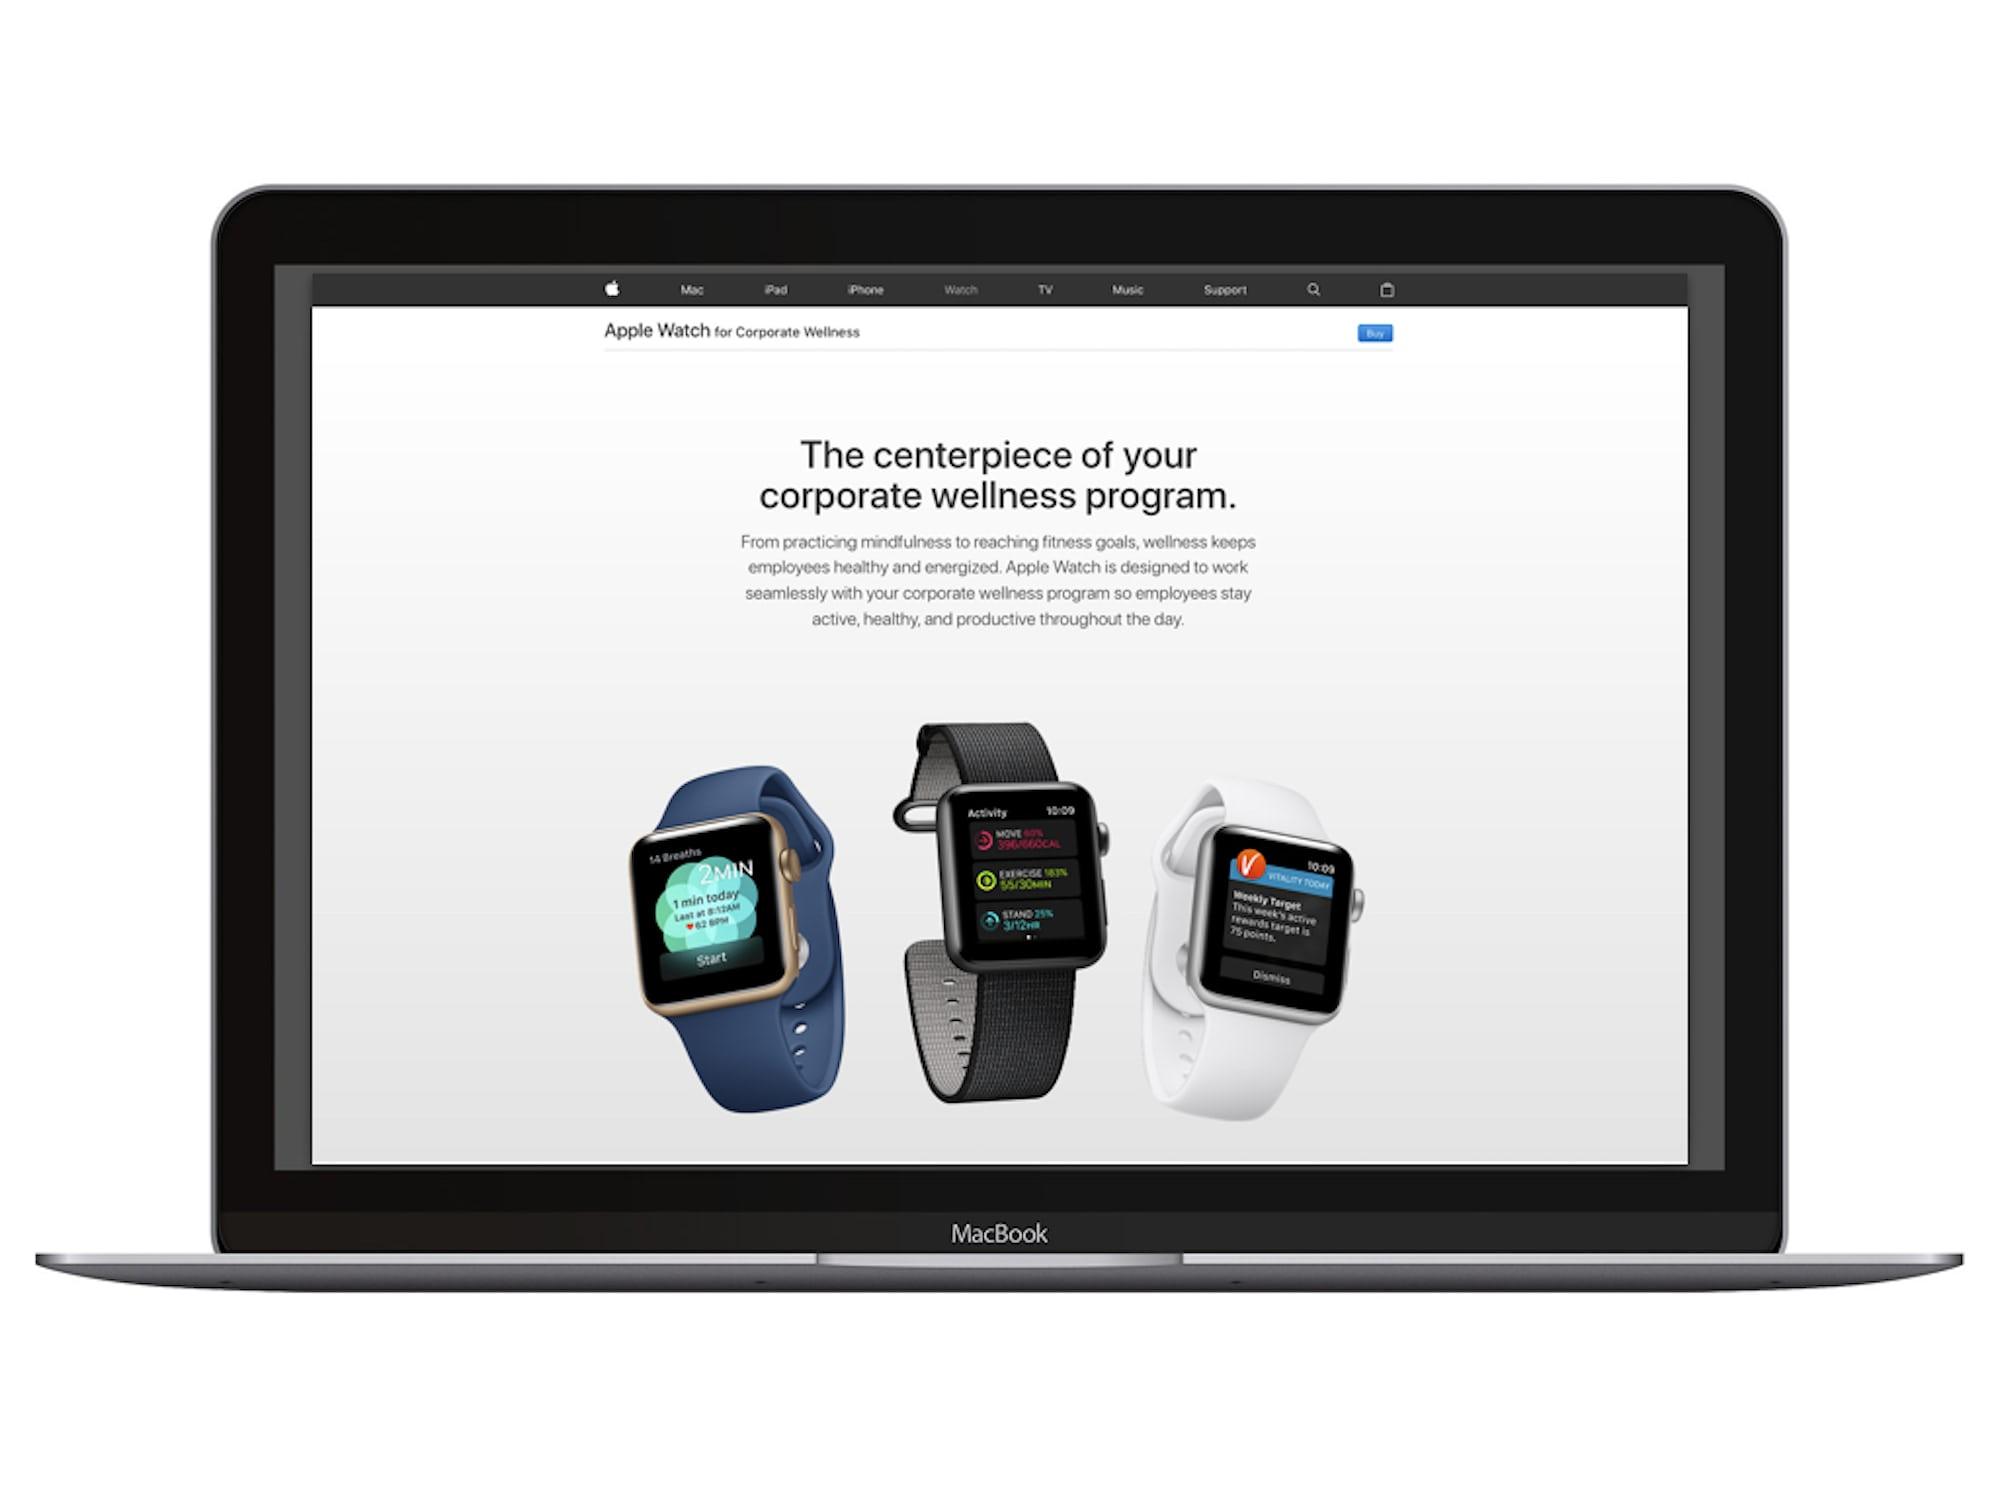 A Week On The Wrist: The Apple Watch Series 3 Edition A Week On The Wrist: The Apple Watch Series 3 Edition AppleWellness